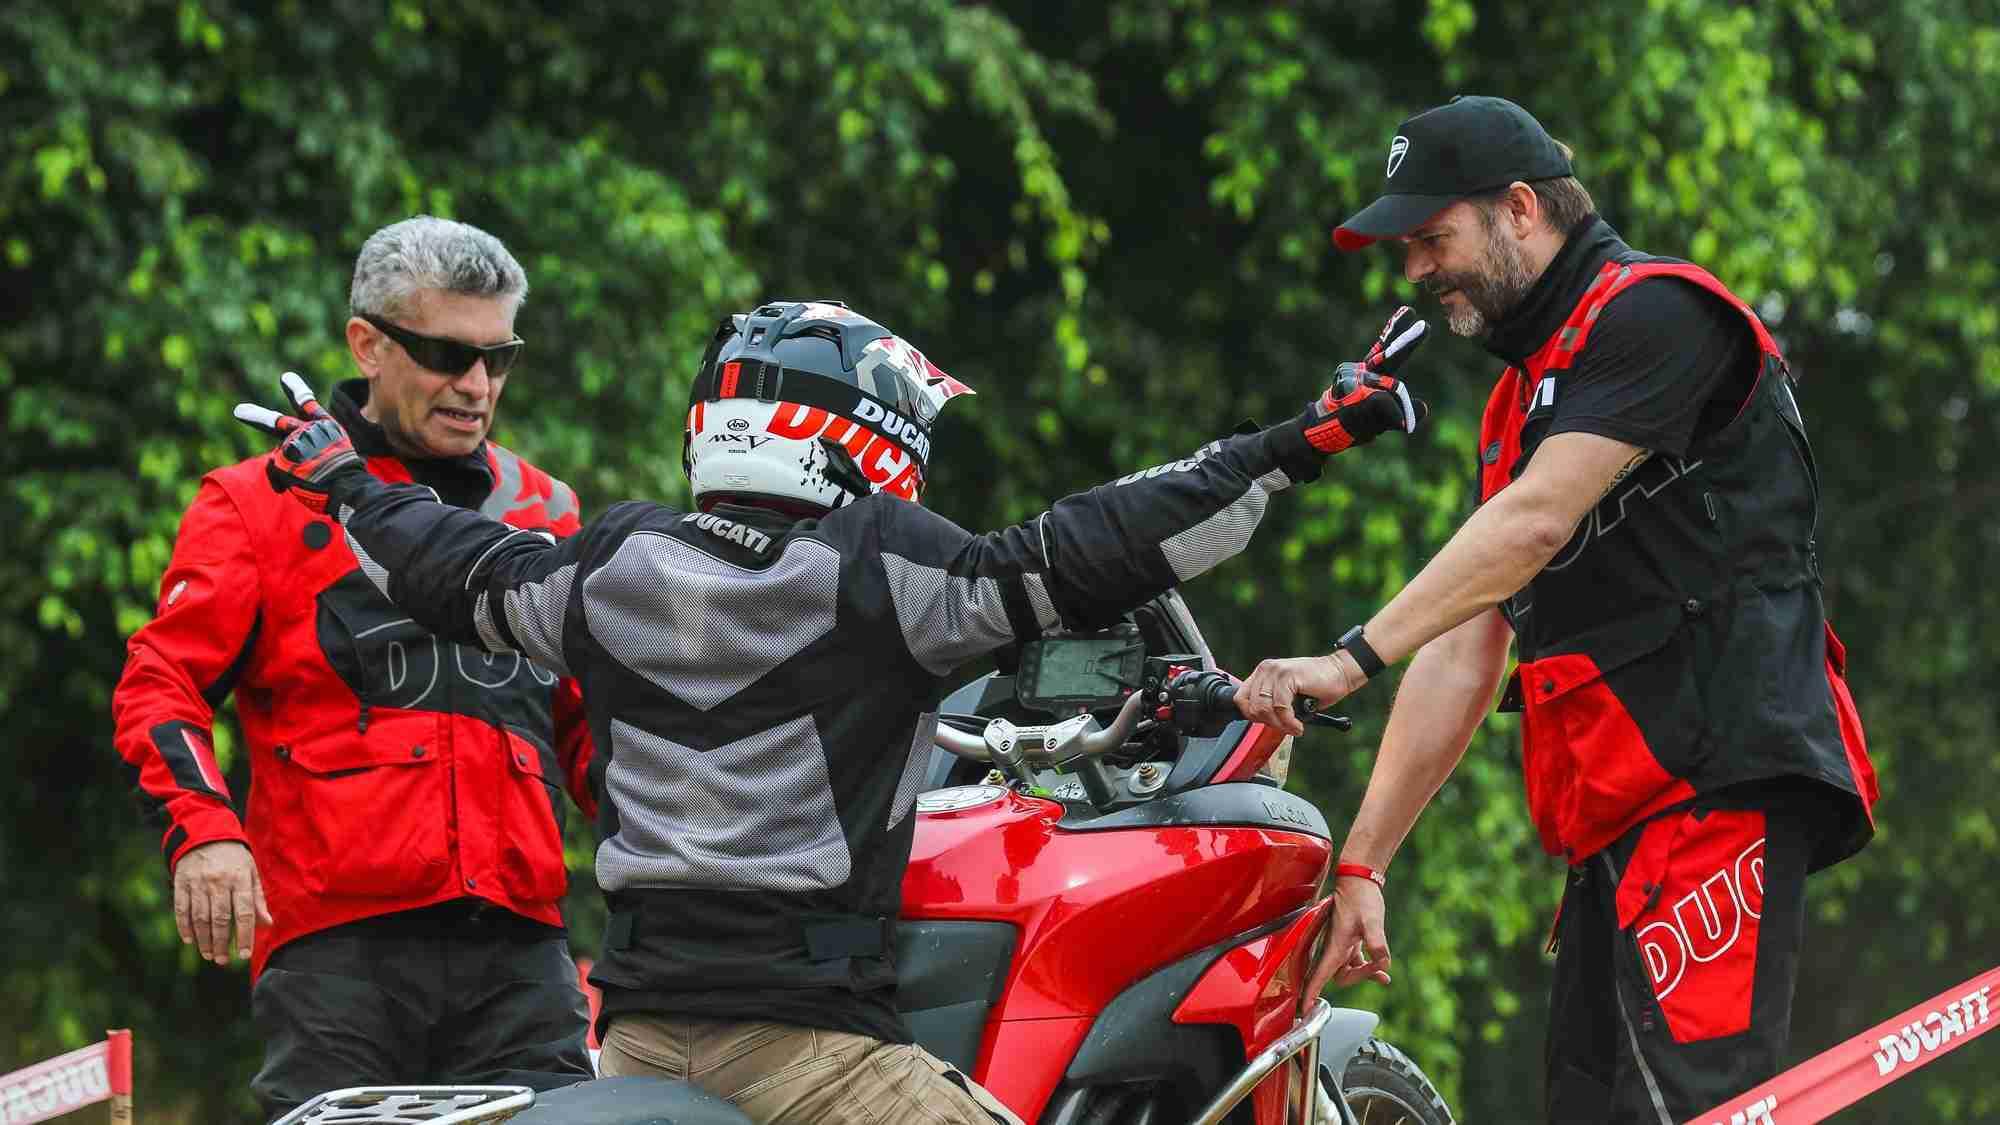 Ducati DRE-Off Road Days India